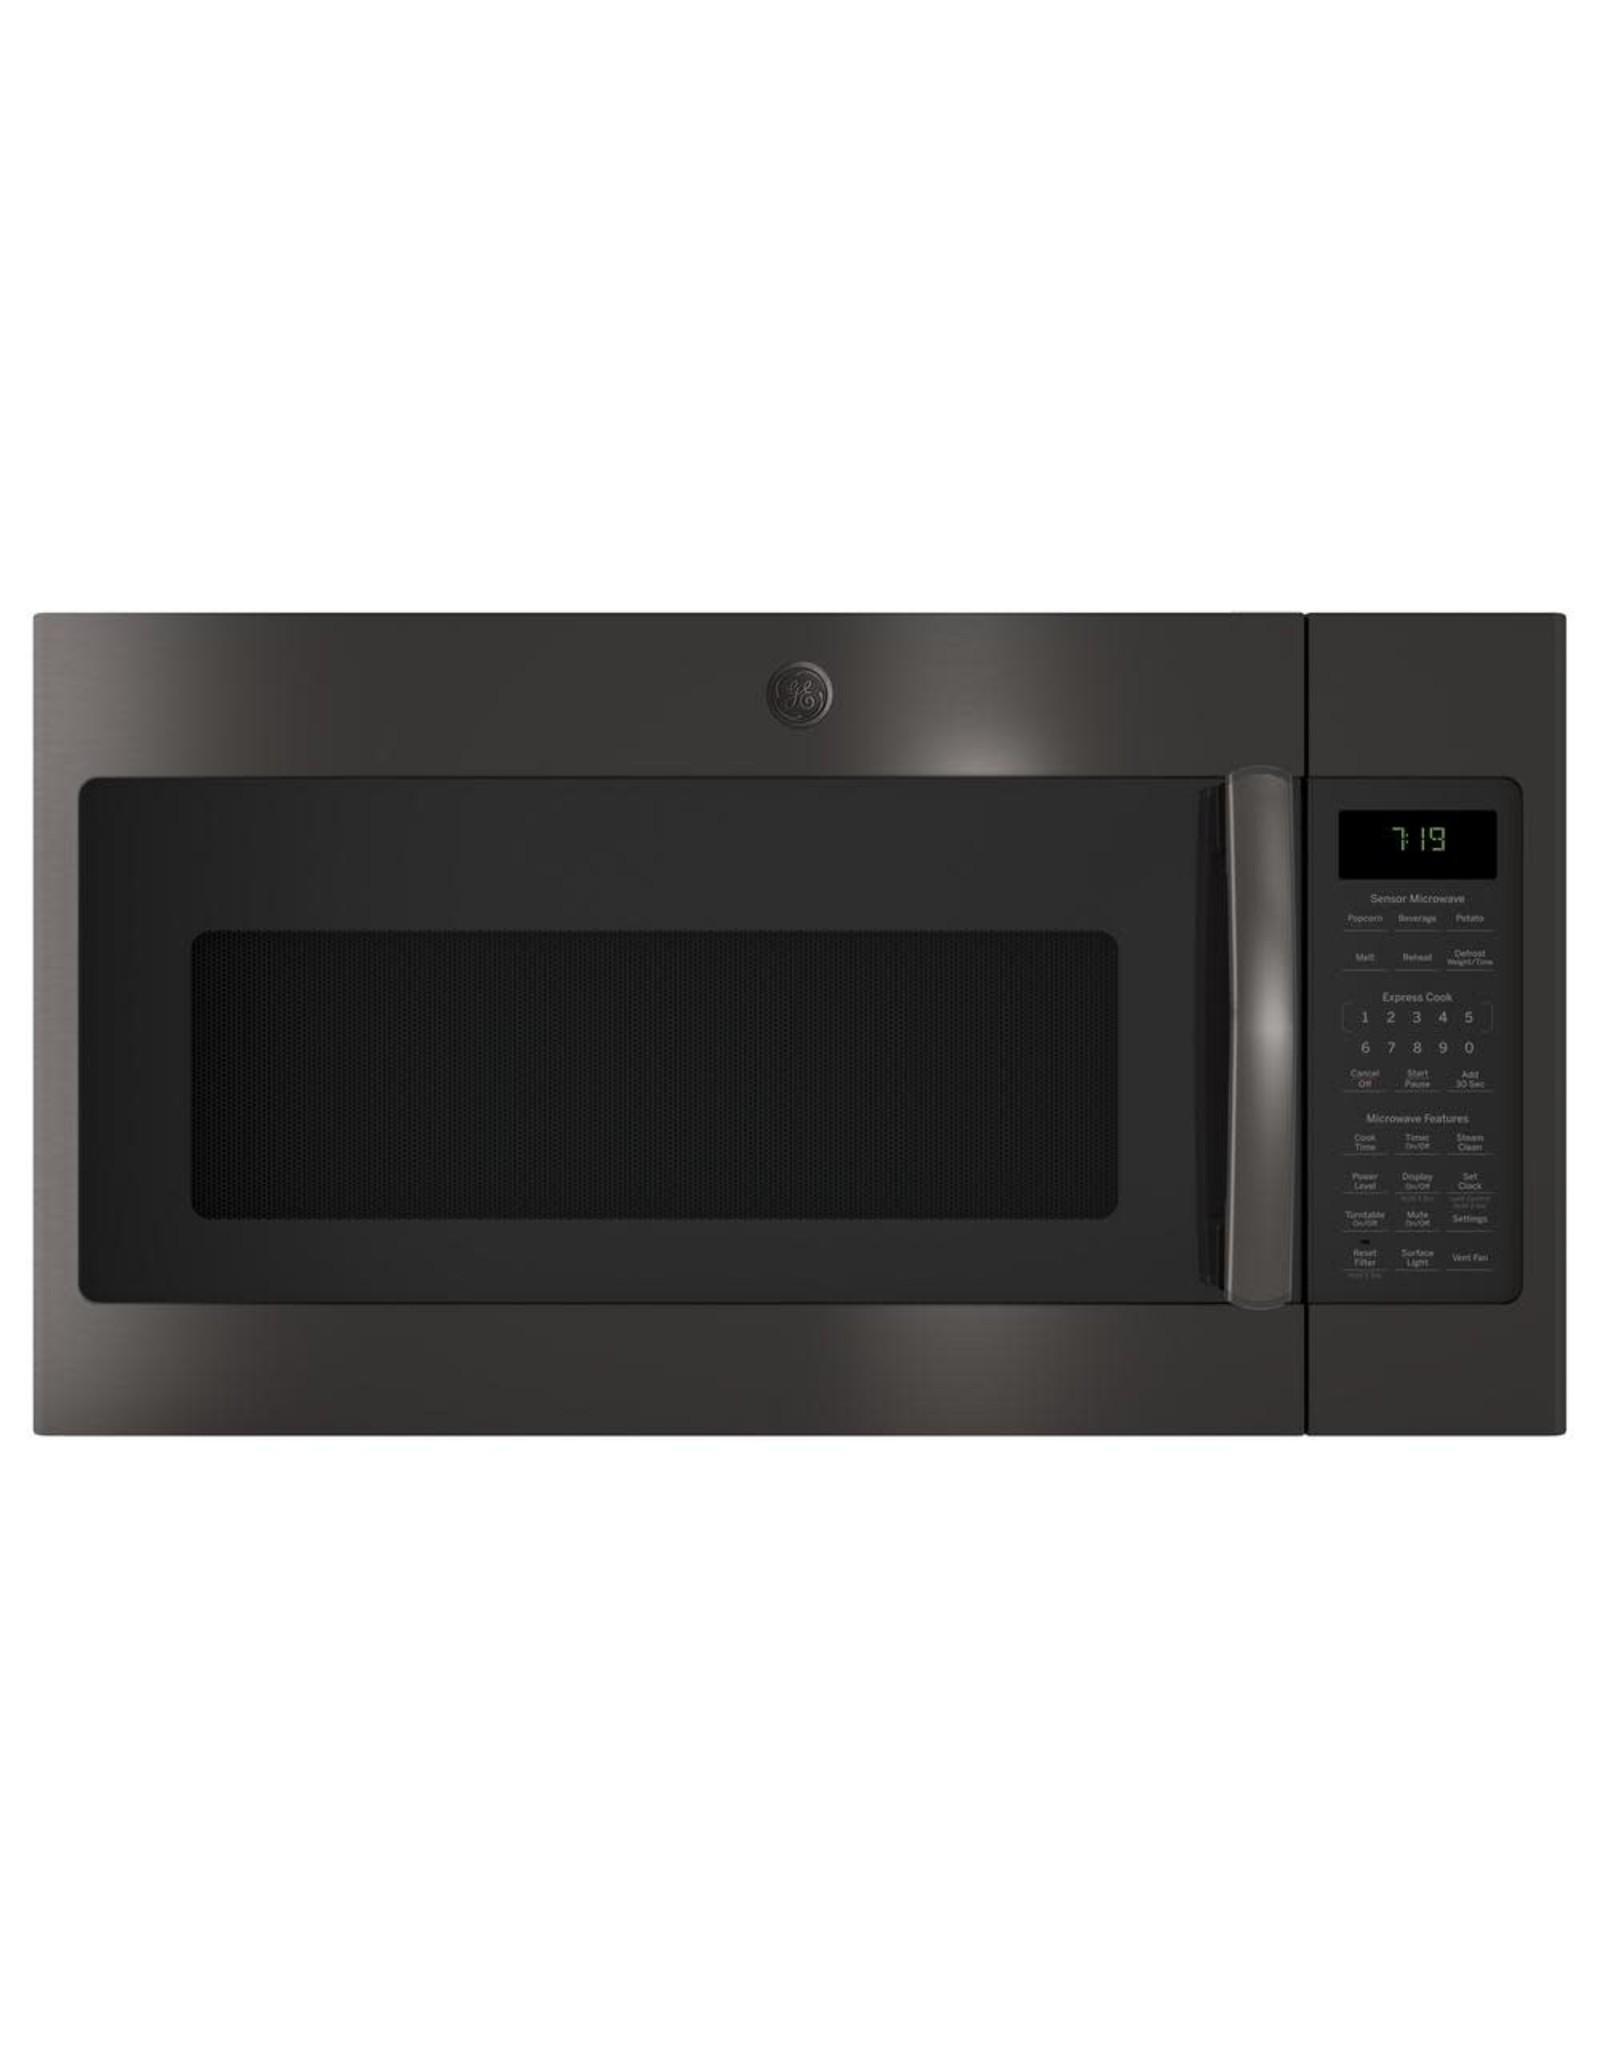 JVM7195BLTS  1.9 cu. ft. Over the Range Microwave in Black Stainless Steel with Sensor Cooking, Fingerprint Resistant